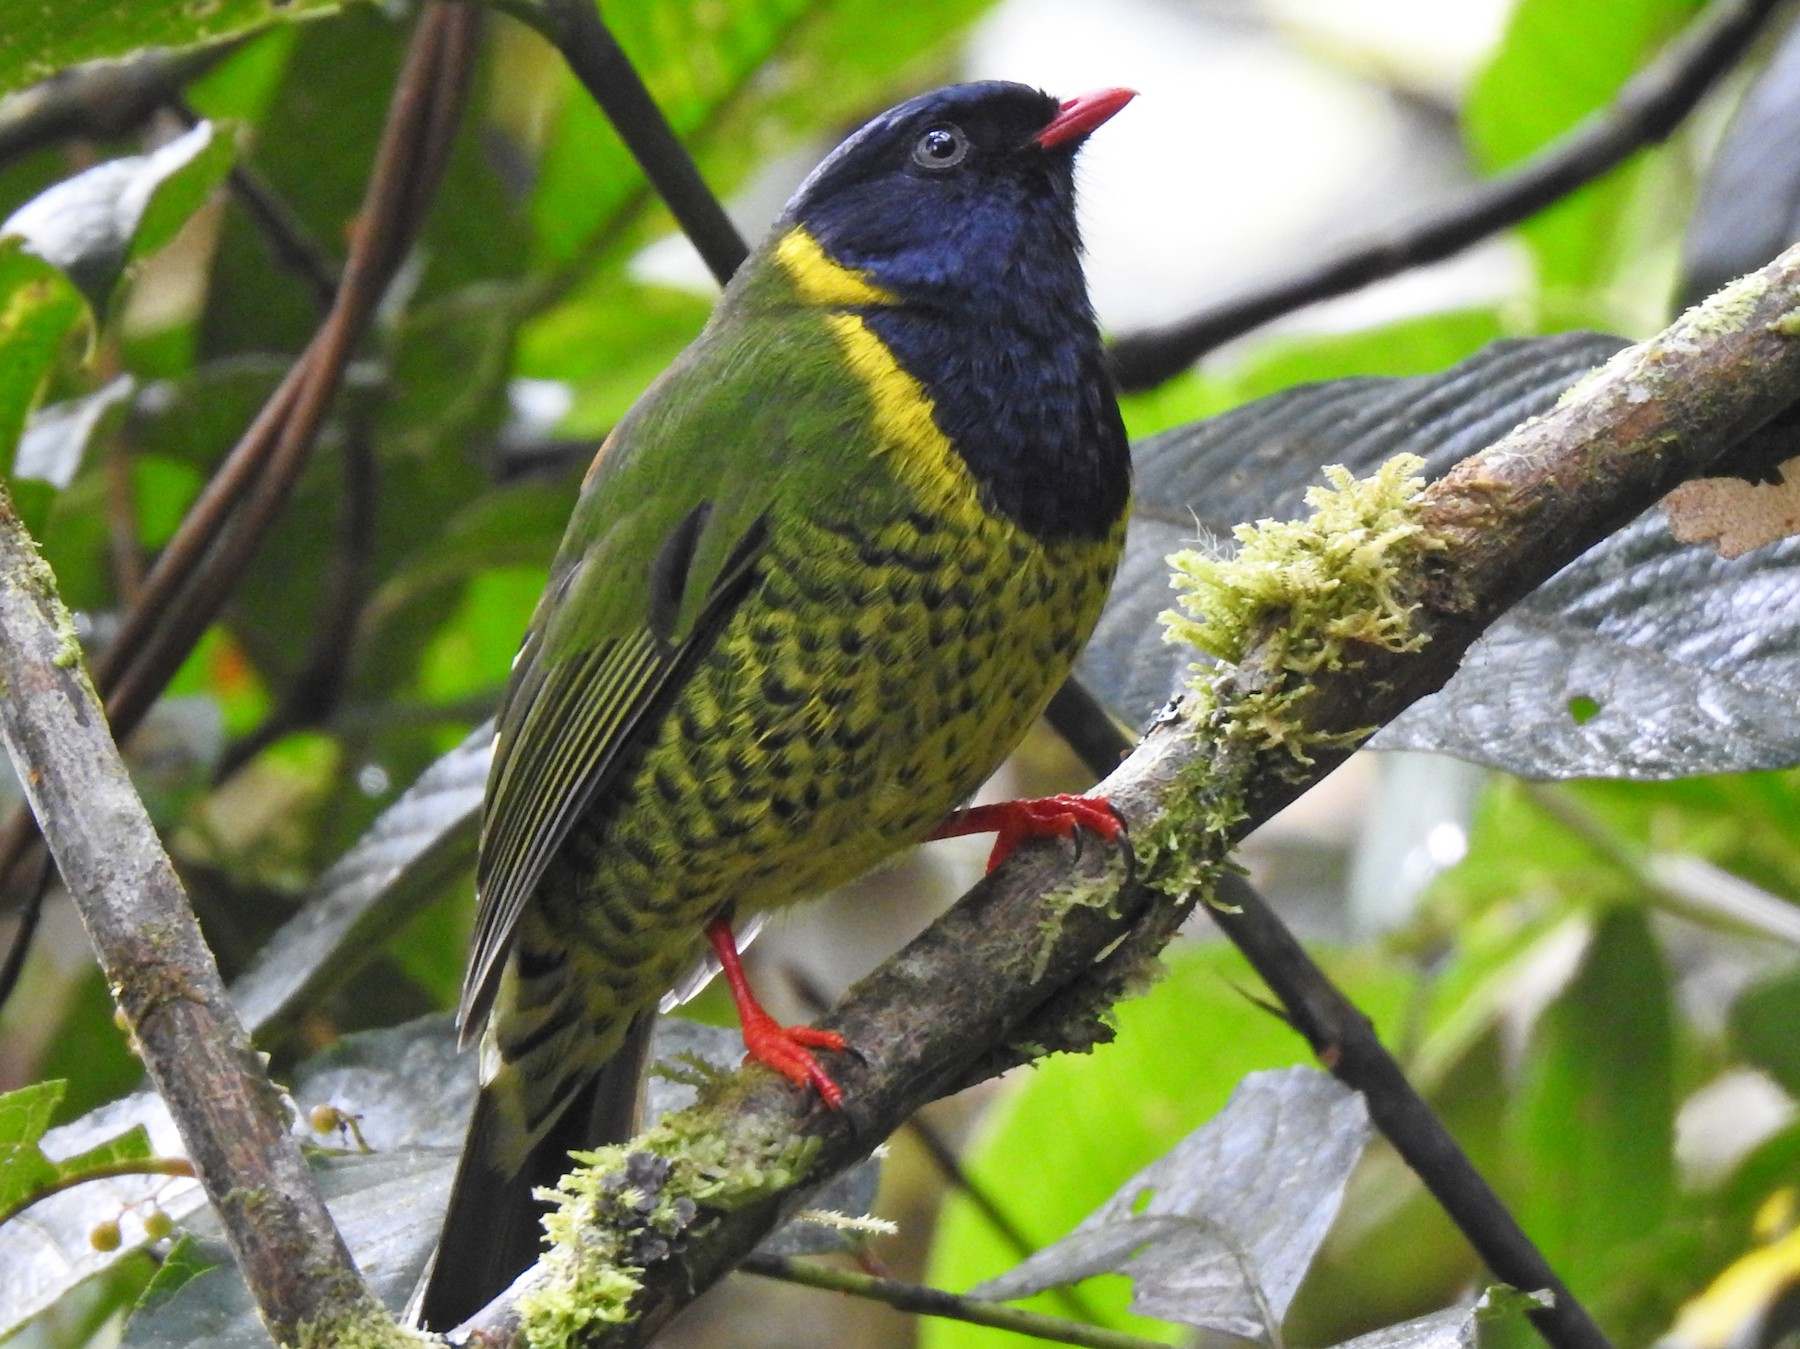 Band-tailed Fruiteater - Julio Giraldo